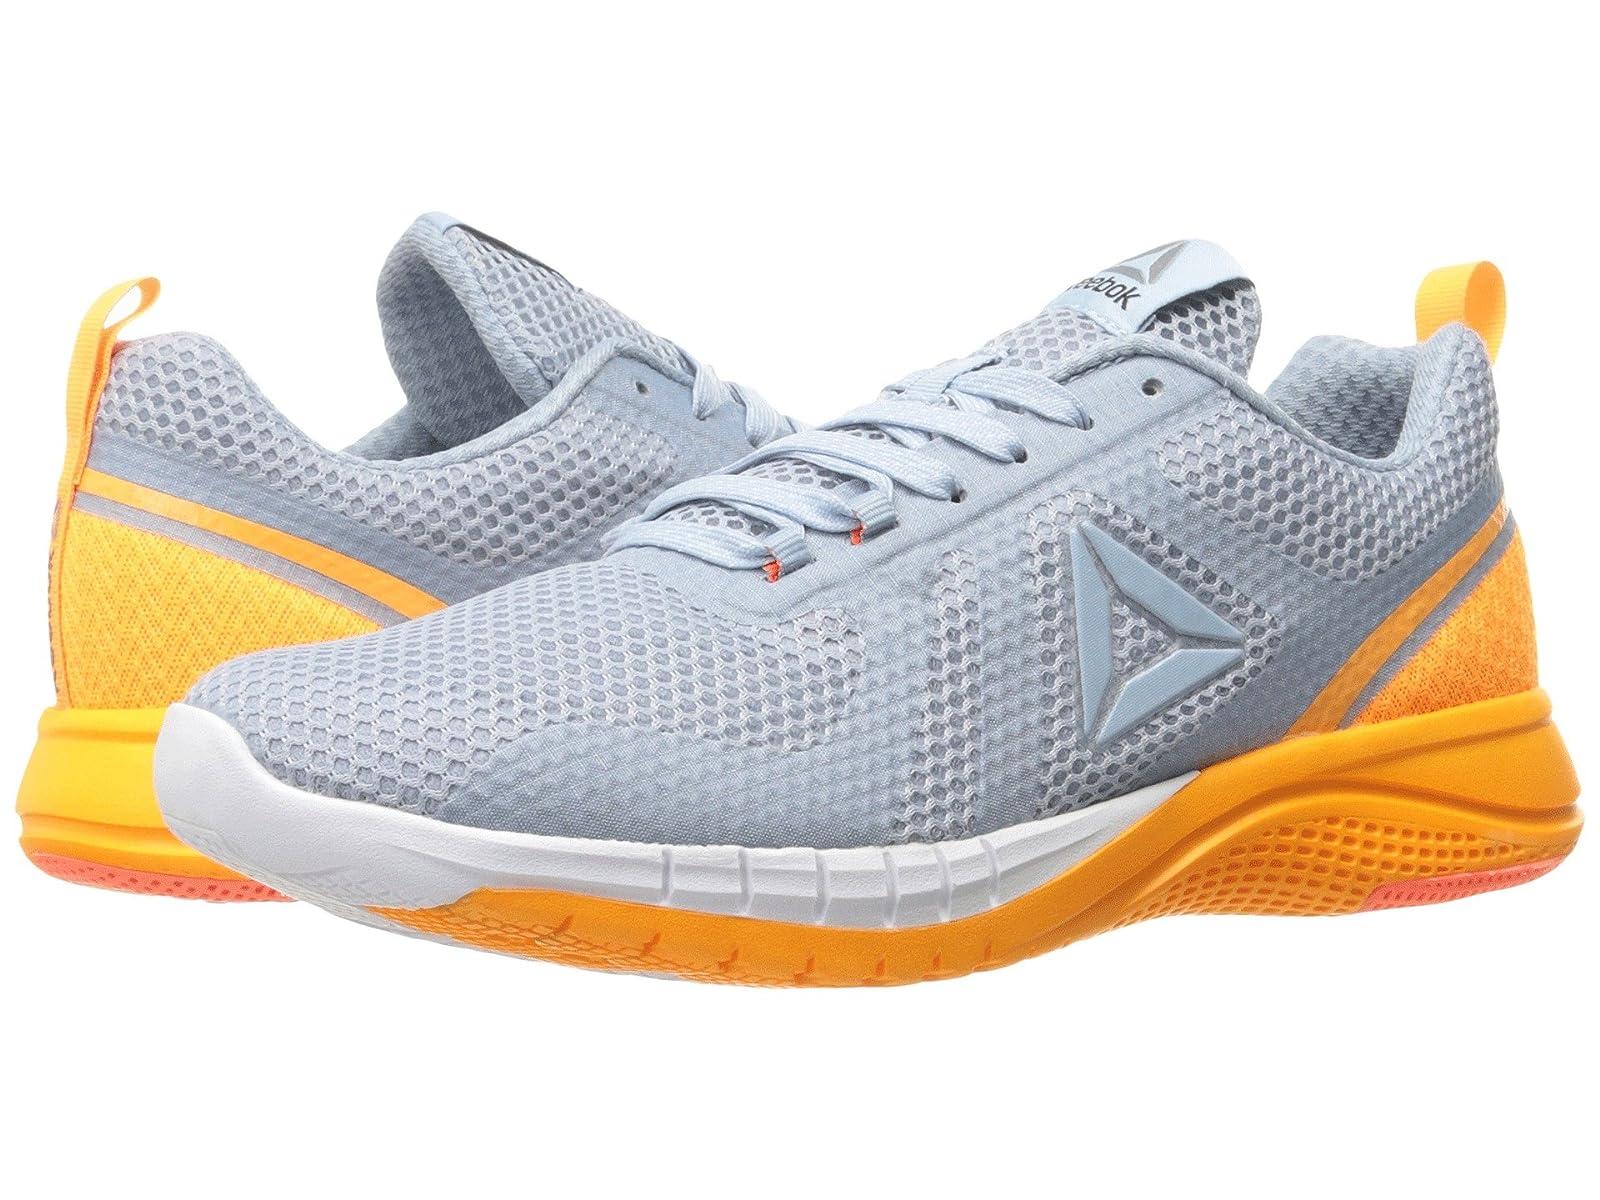 Reebok Print Run 2.0Cheap and distinctive eye-catching shoes